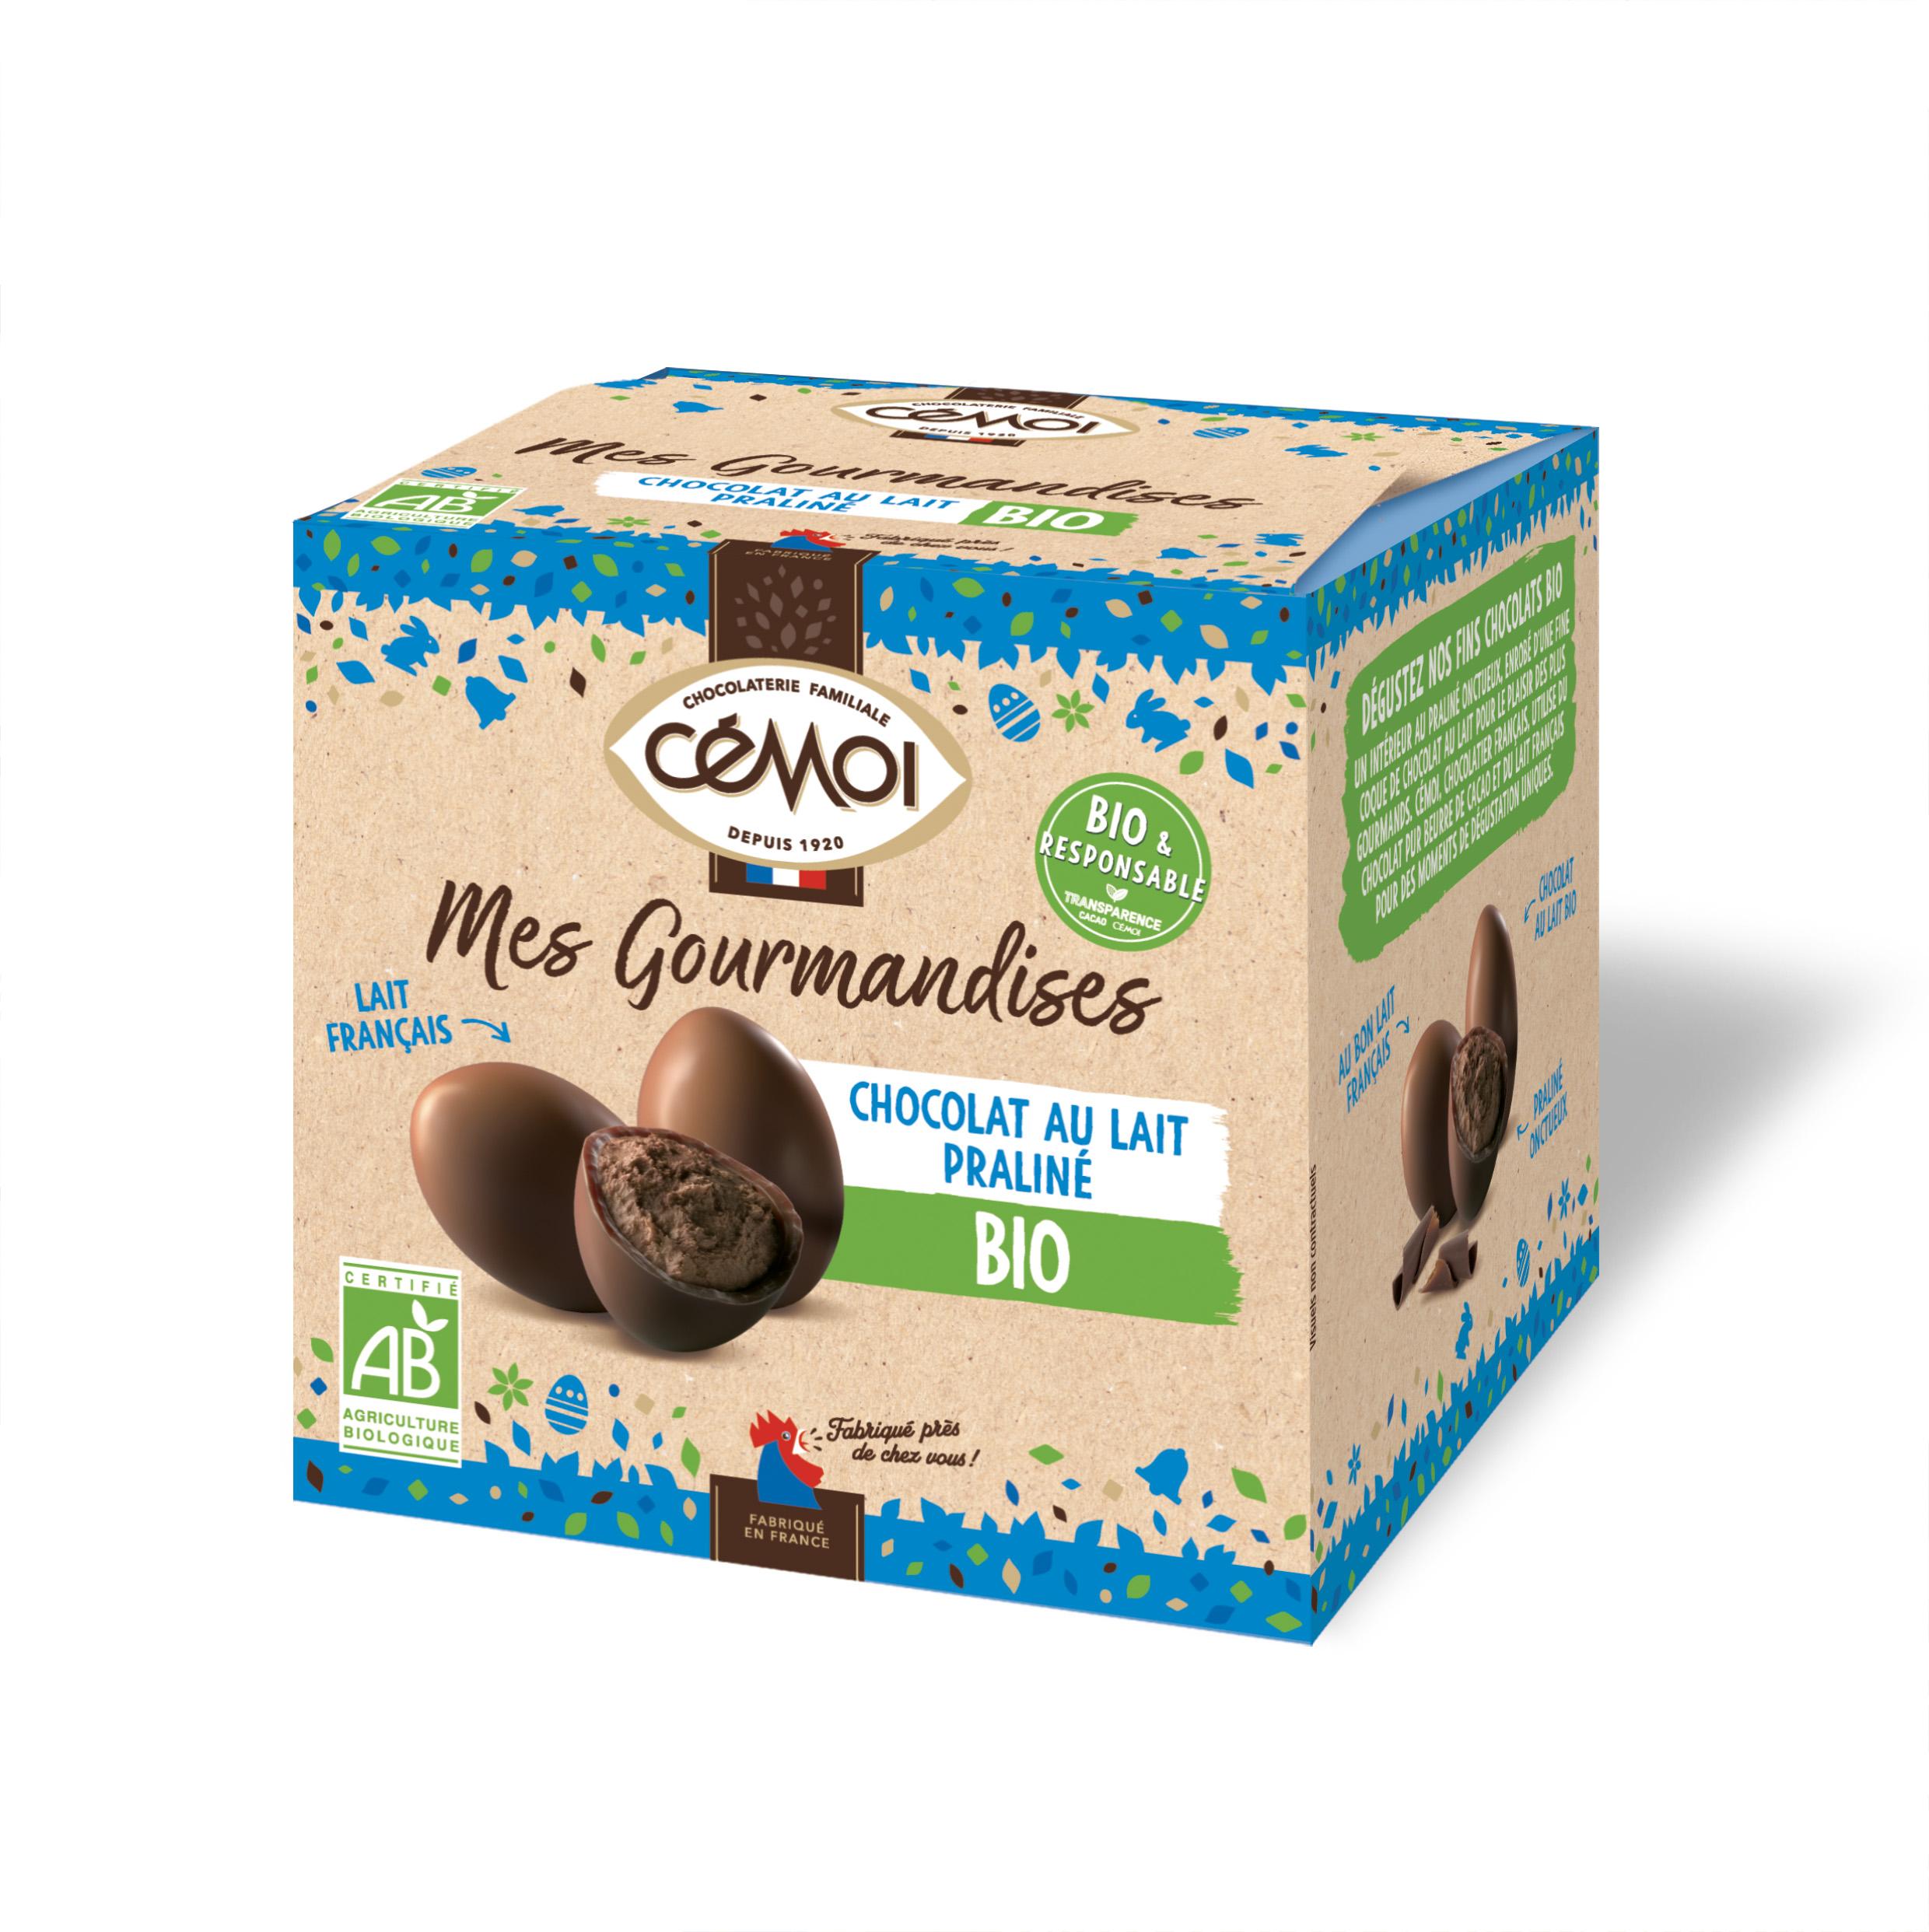 joyeuse fête de pâques chocolatier CEMOI morandmors oeuf chocolat lait noir bio français